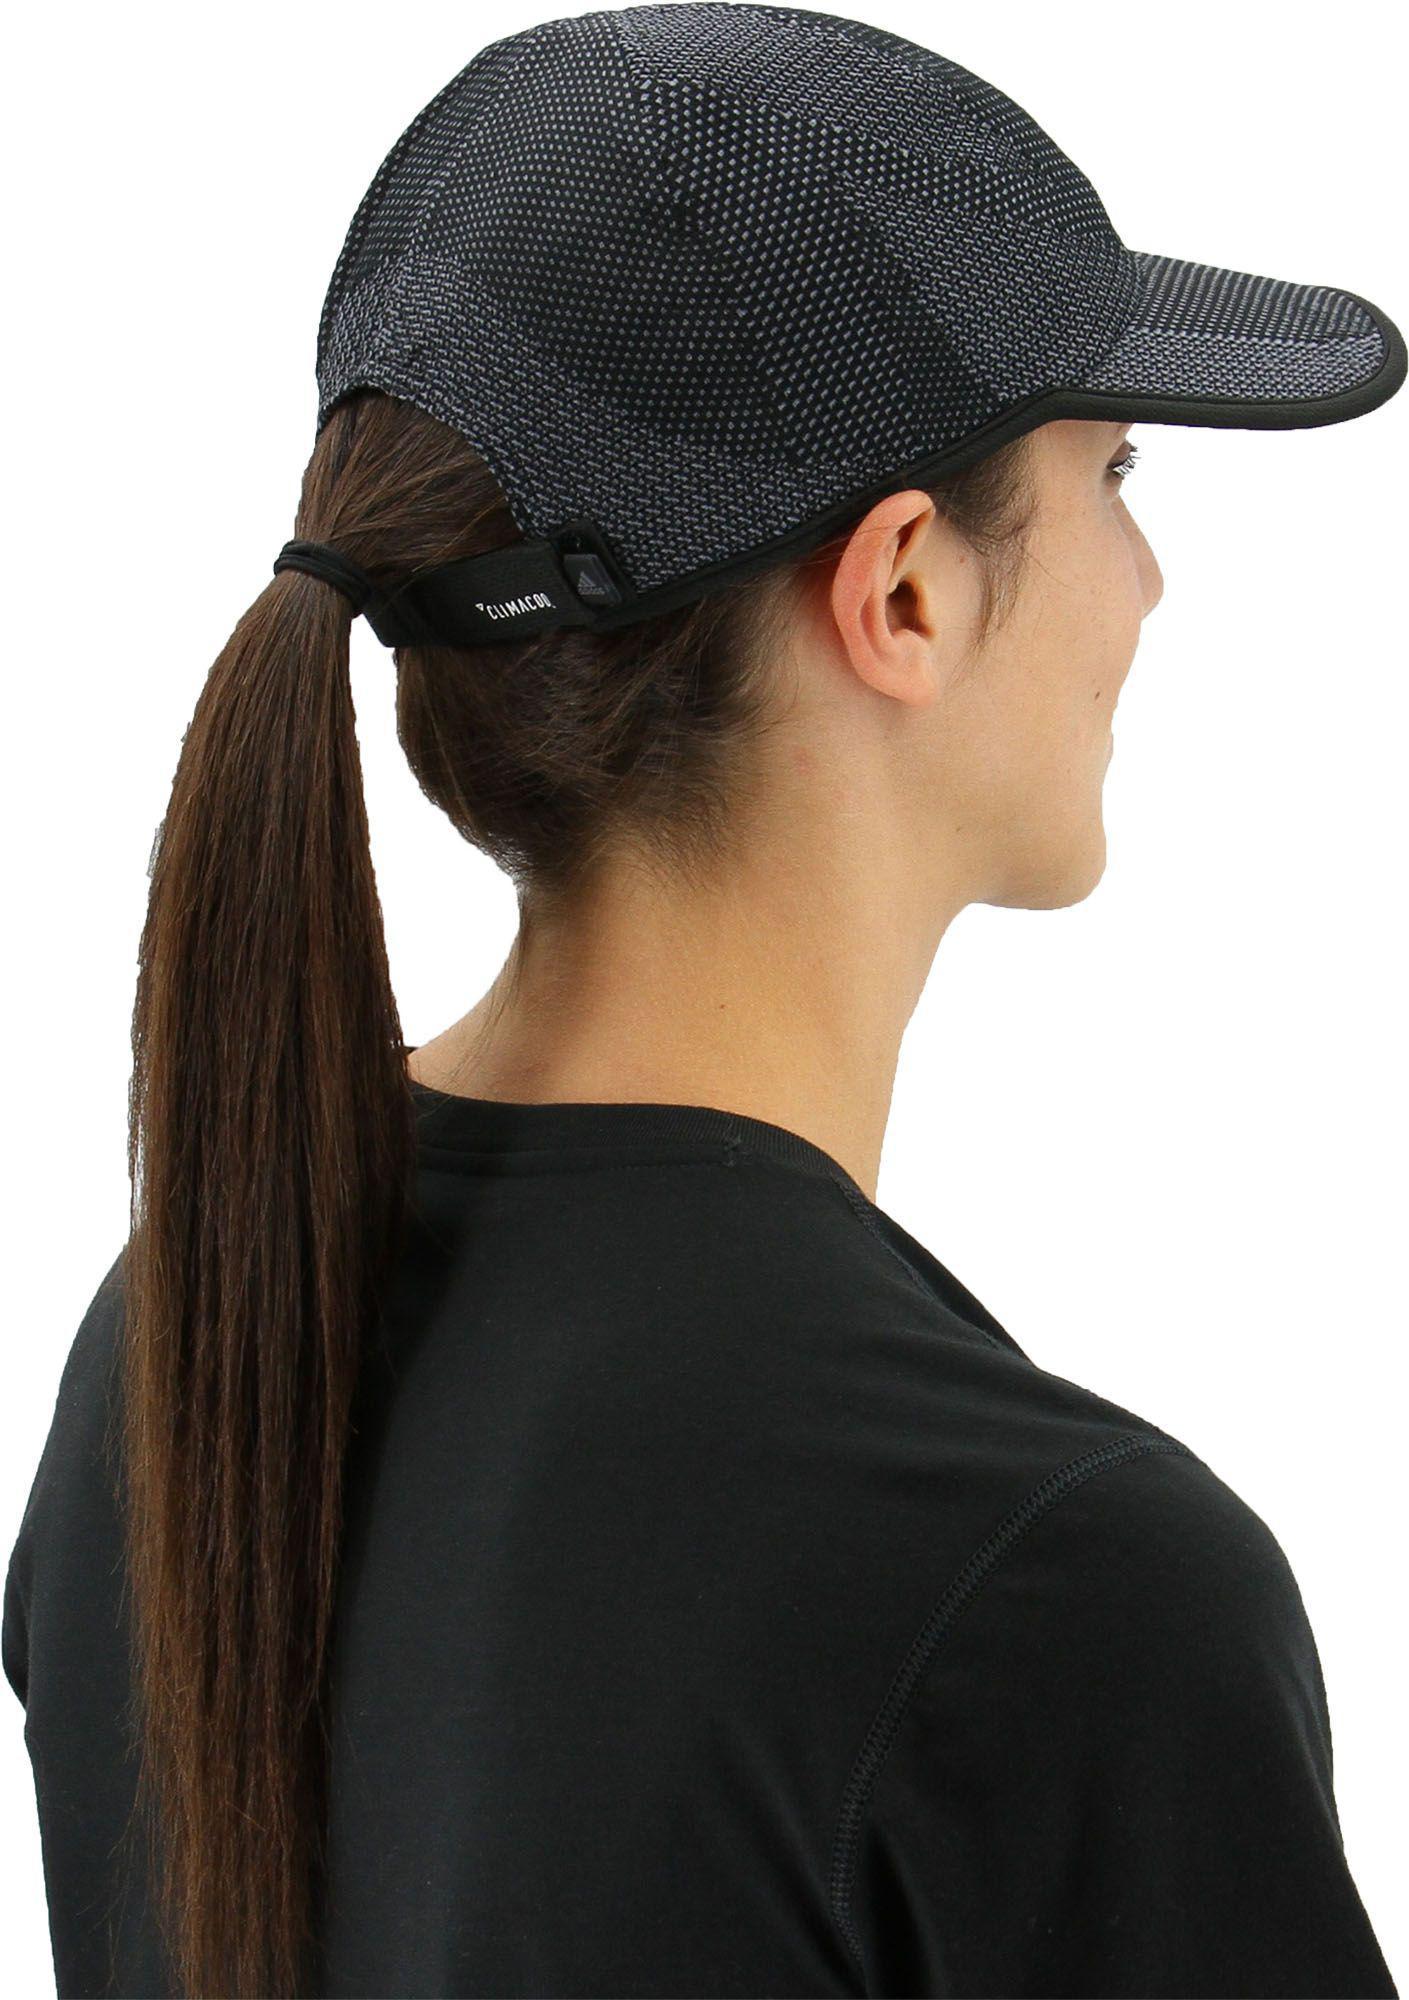 Lyst - adidas Superlite Prime Hat in Black e95ee5dc1de